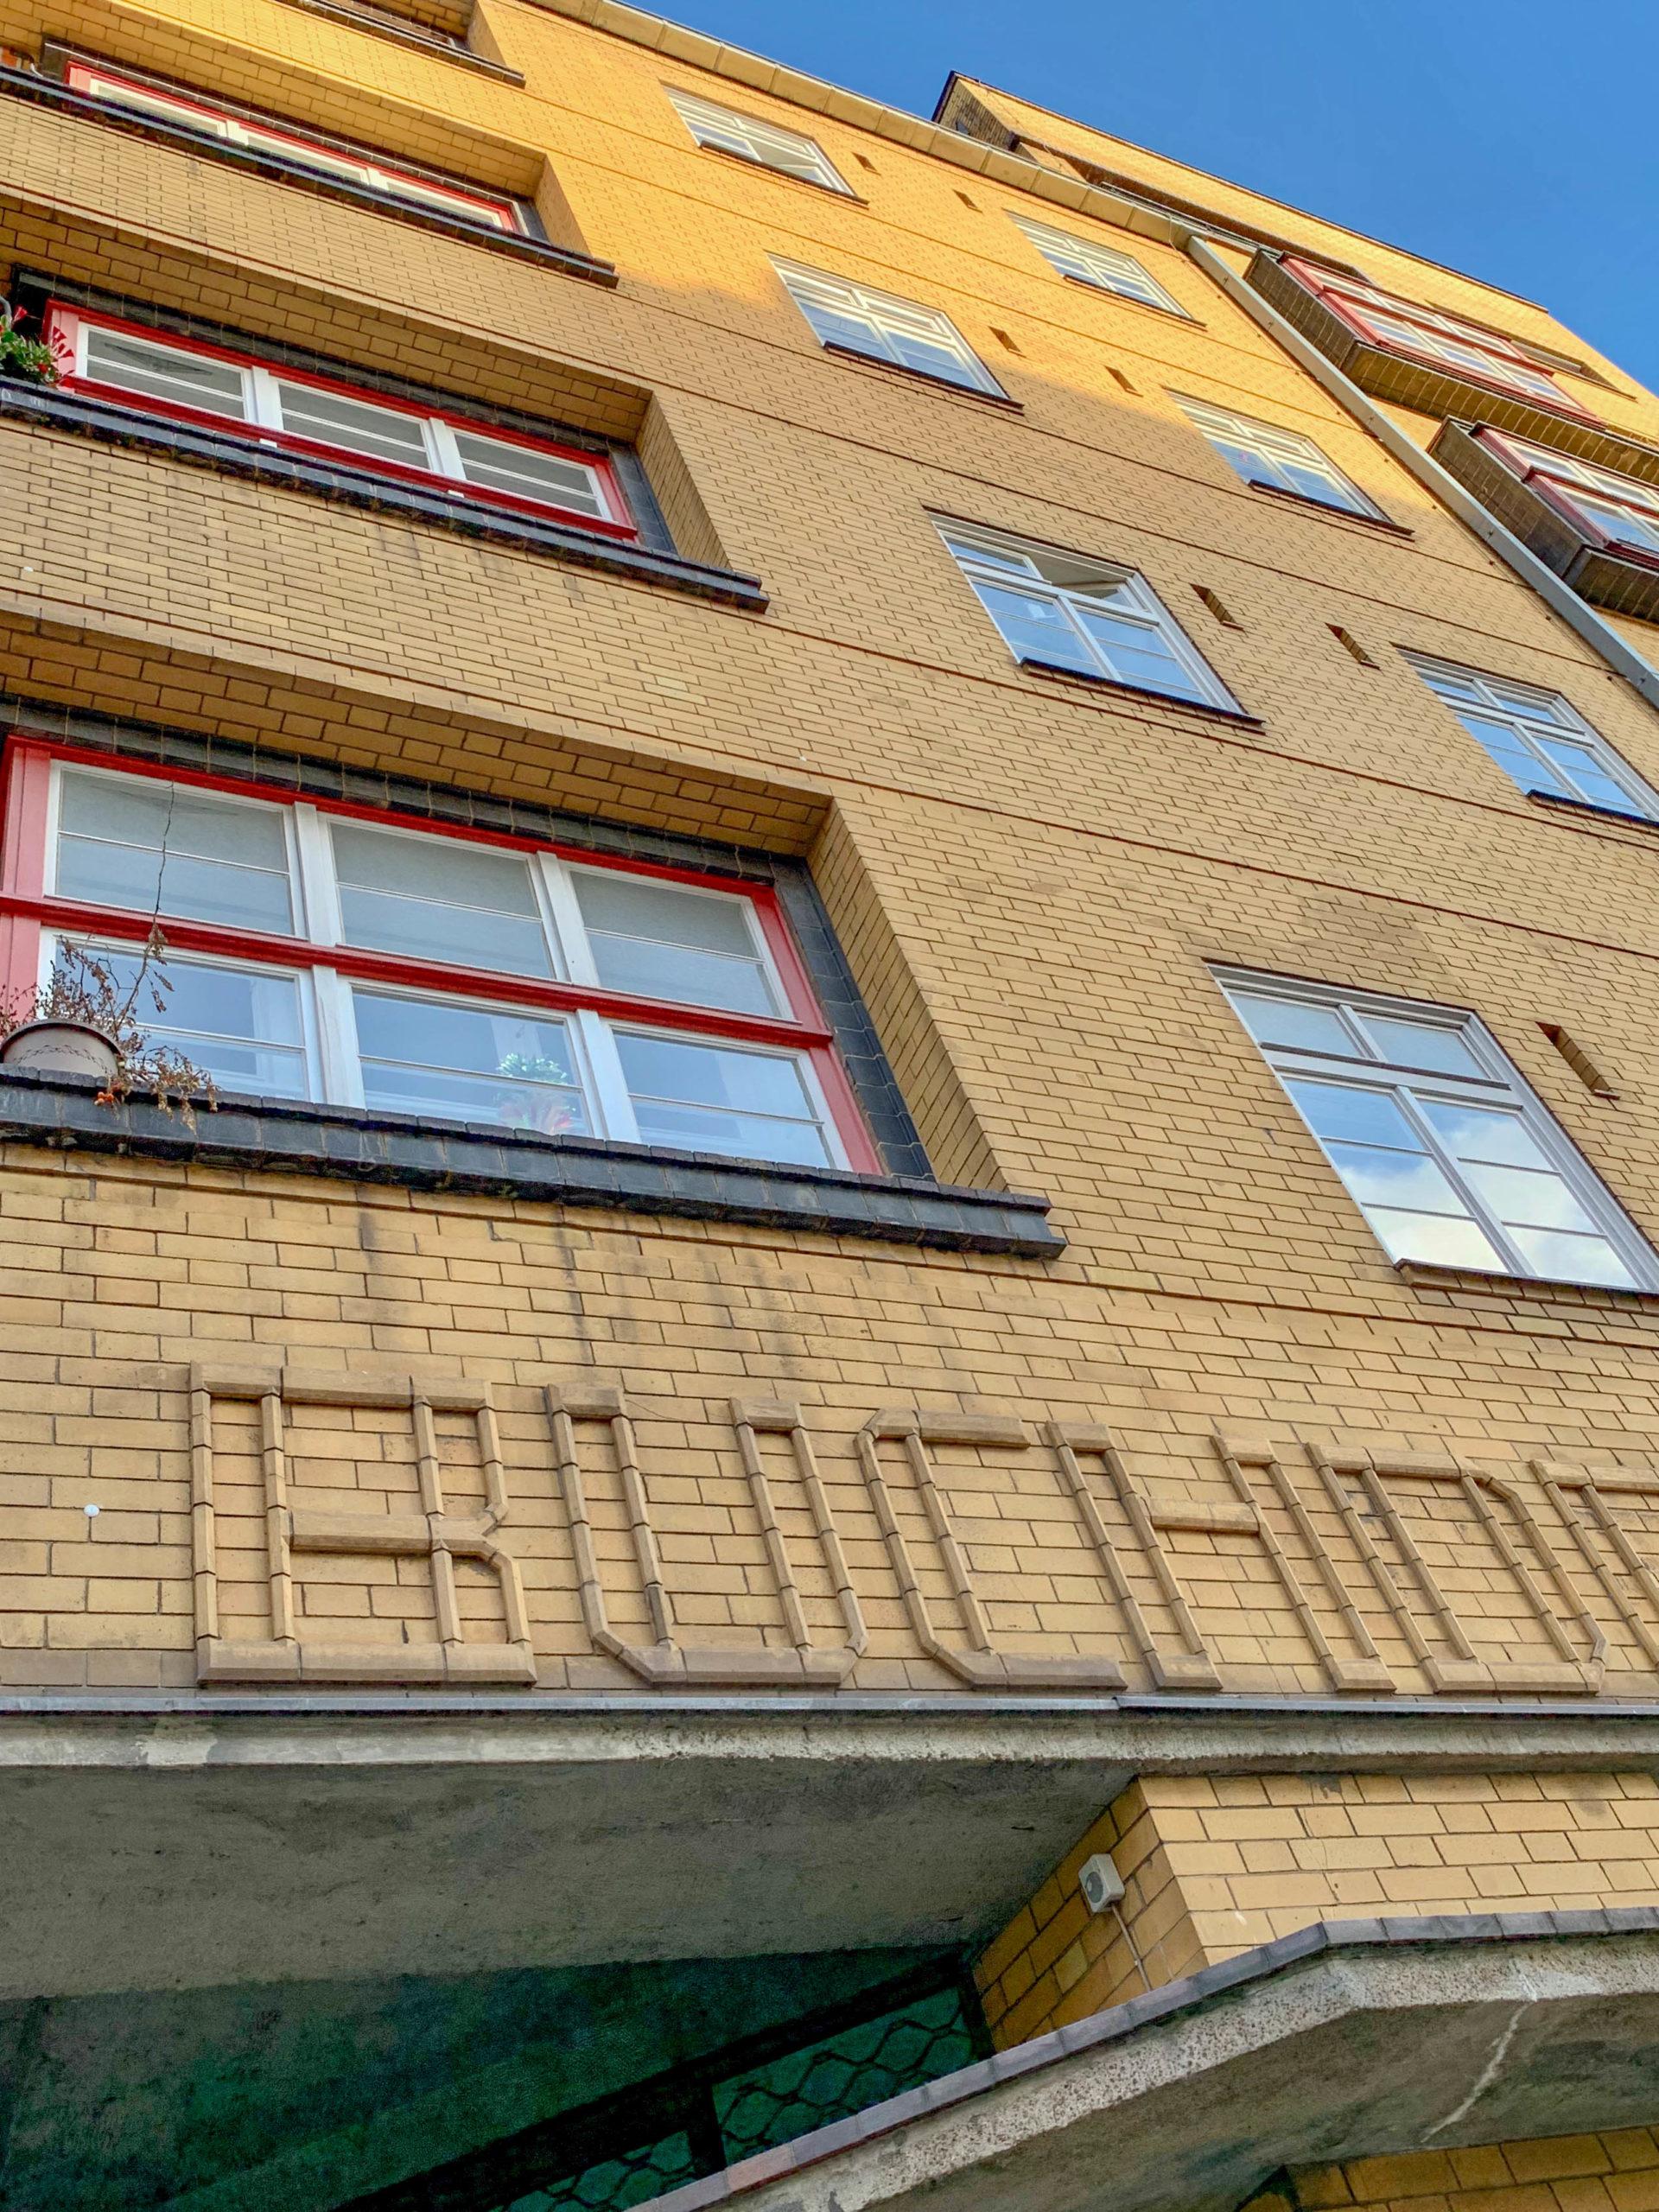 House for the Association of German Bookprinters, 1924-1926. Architects: Max Taut, Franz Hoffmann, Karl Bernhard